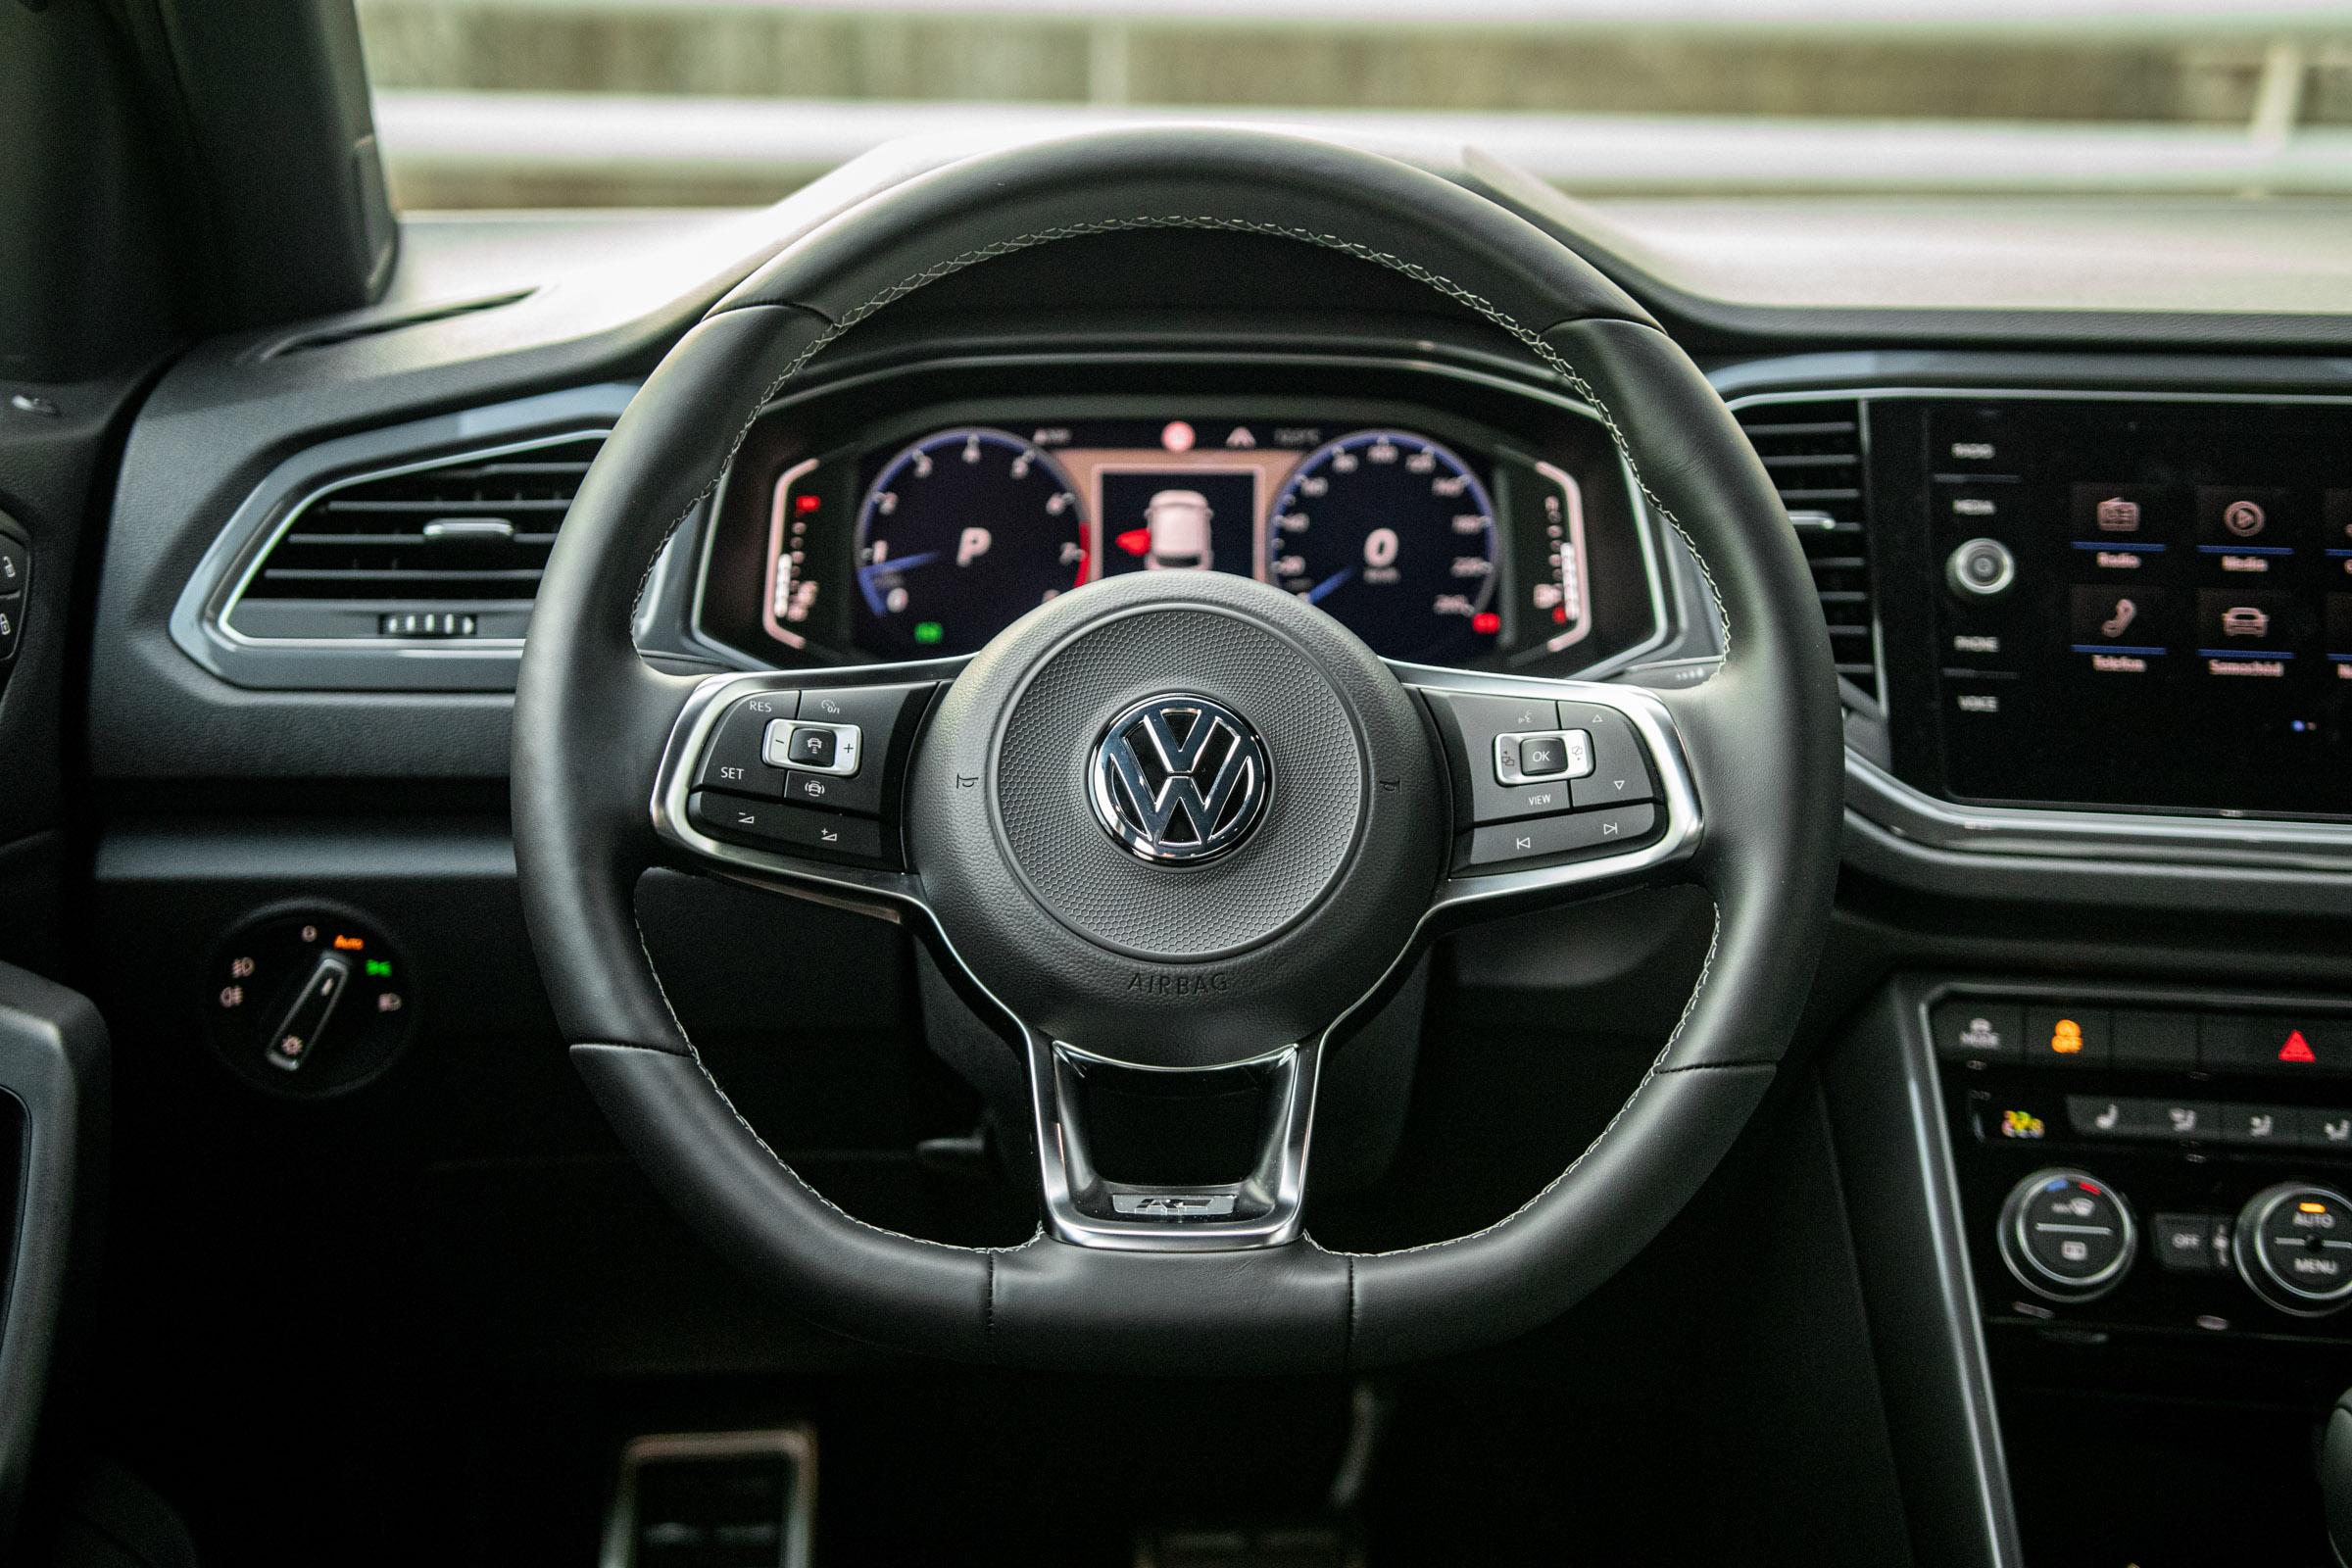 Volkswagen T-Roc 2020 test 1.5 TSI